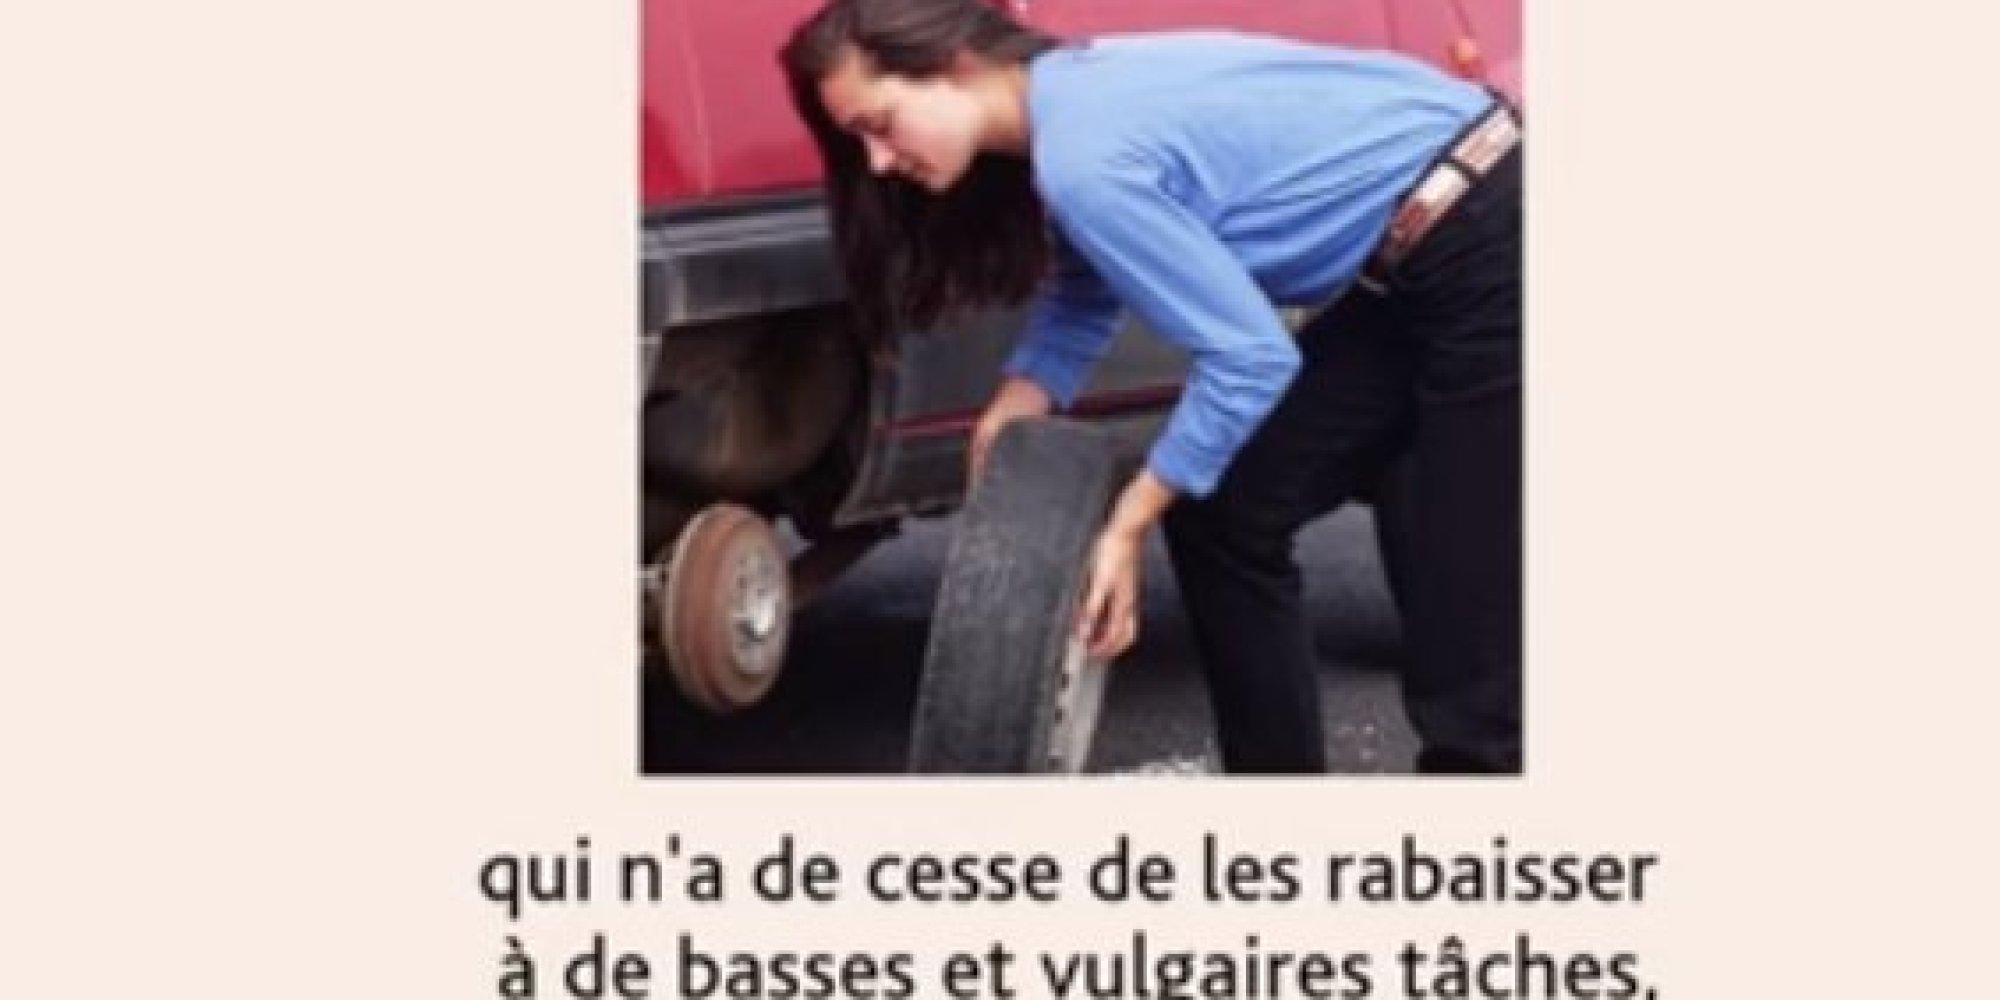 Site De Rencontre Pub - La saga des publicits des sites de rencontres